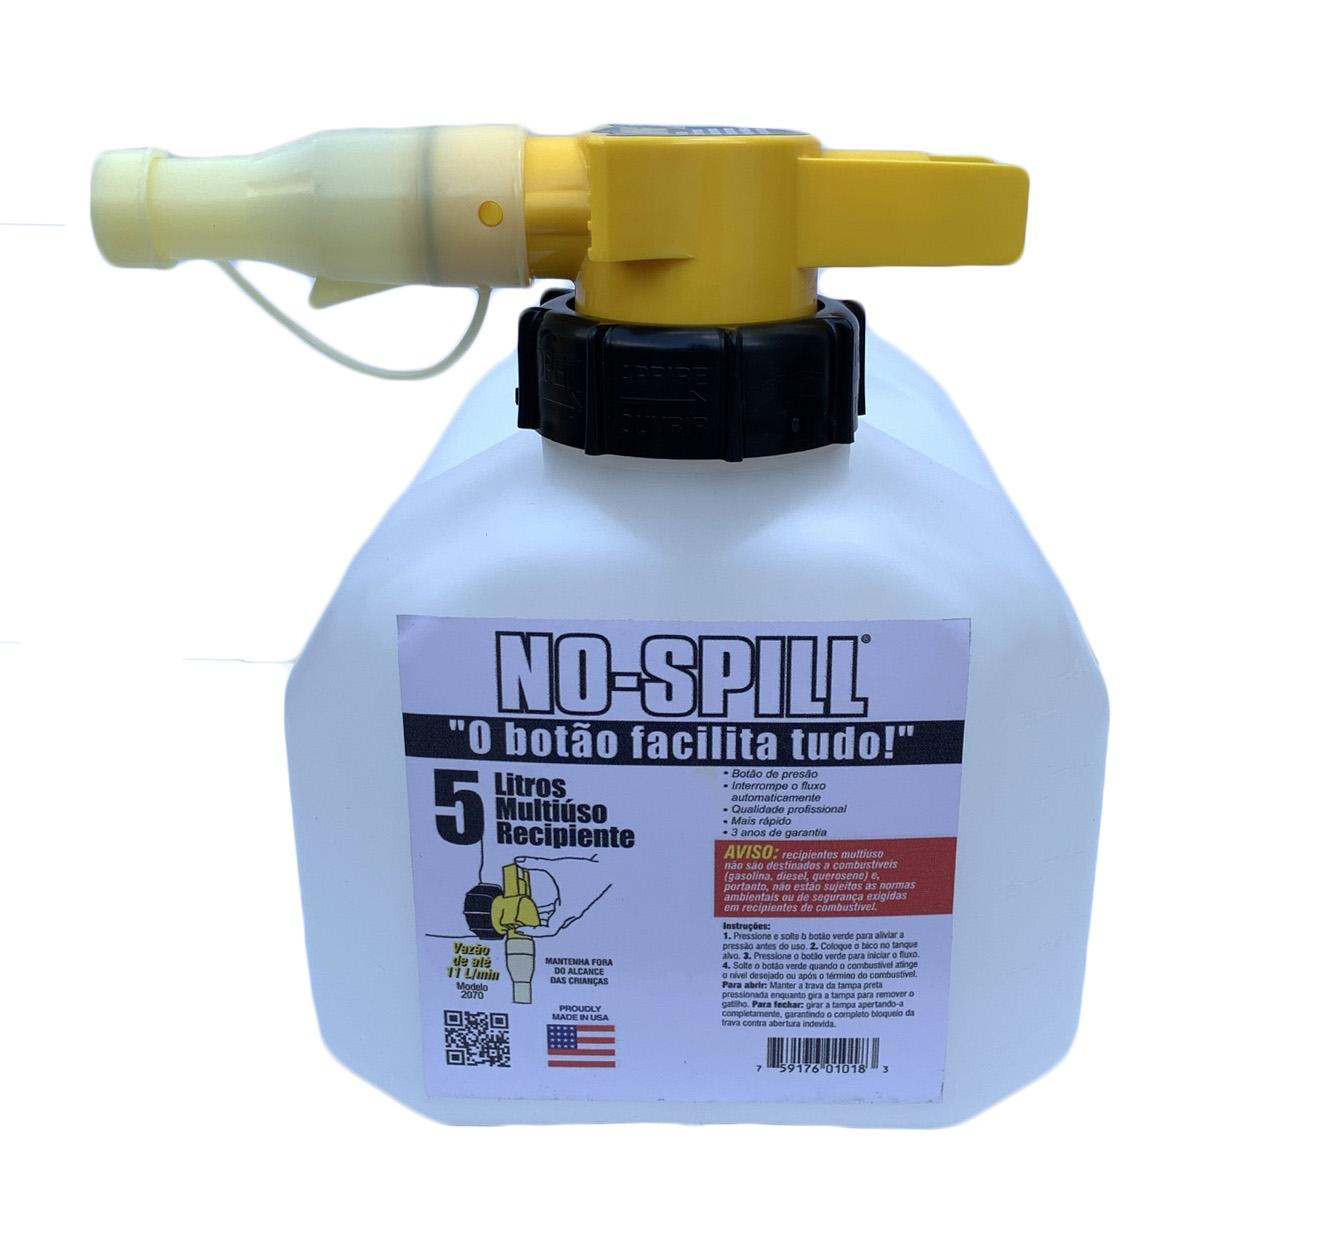 Galão Combustível Lupus 5 Litros Abastecimento Gasolina Diesel Etanol